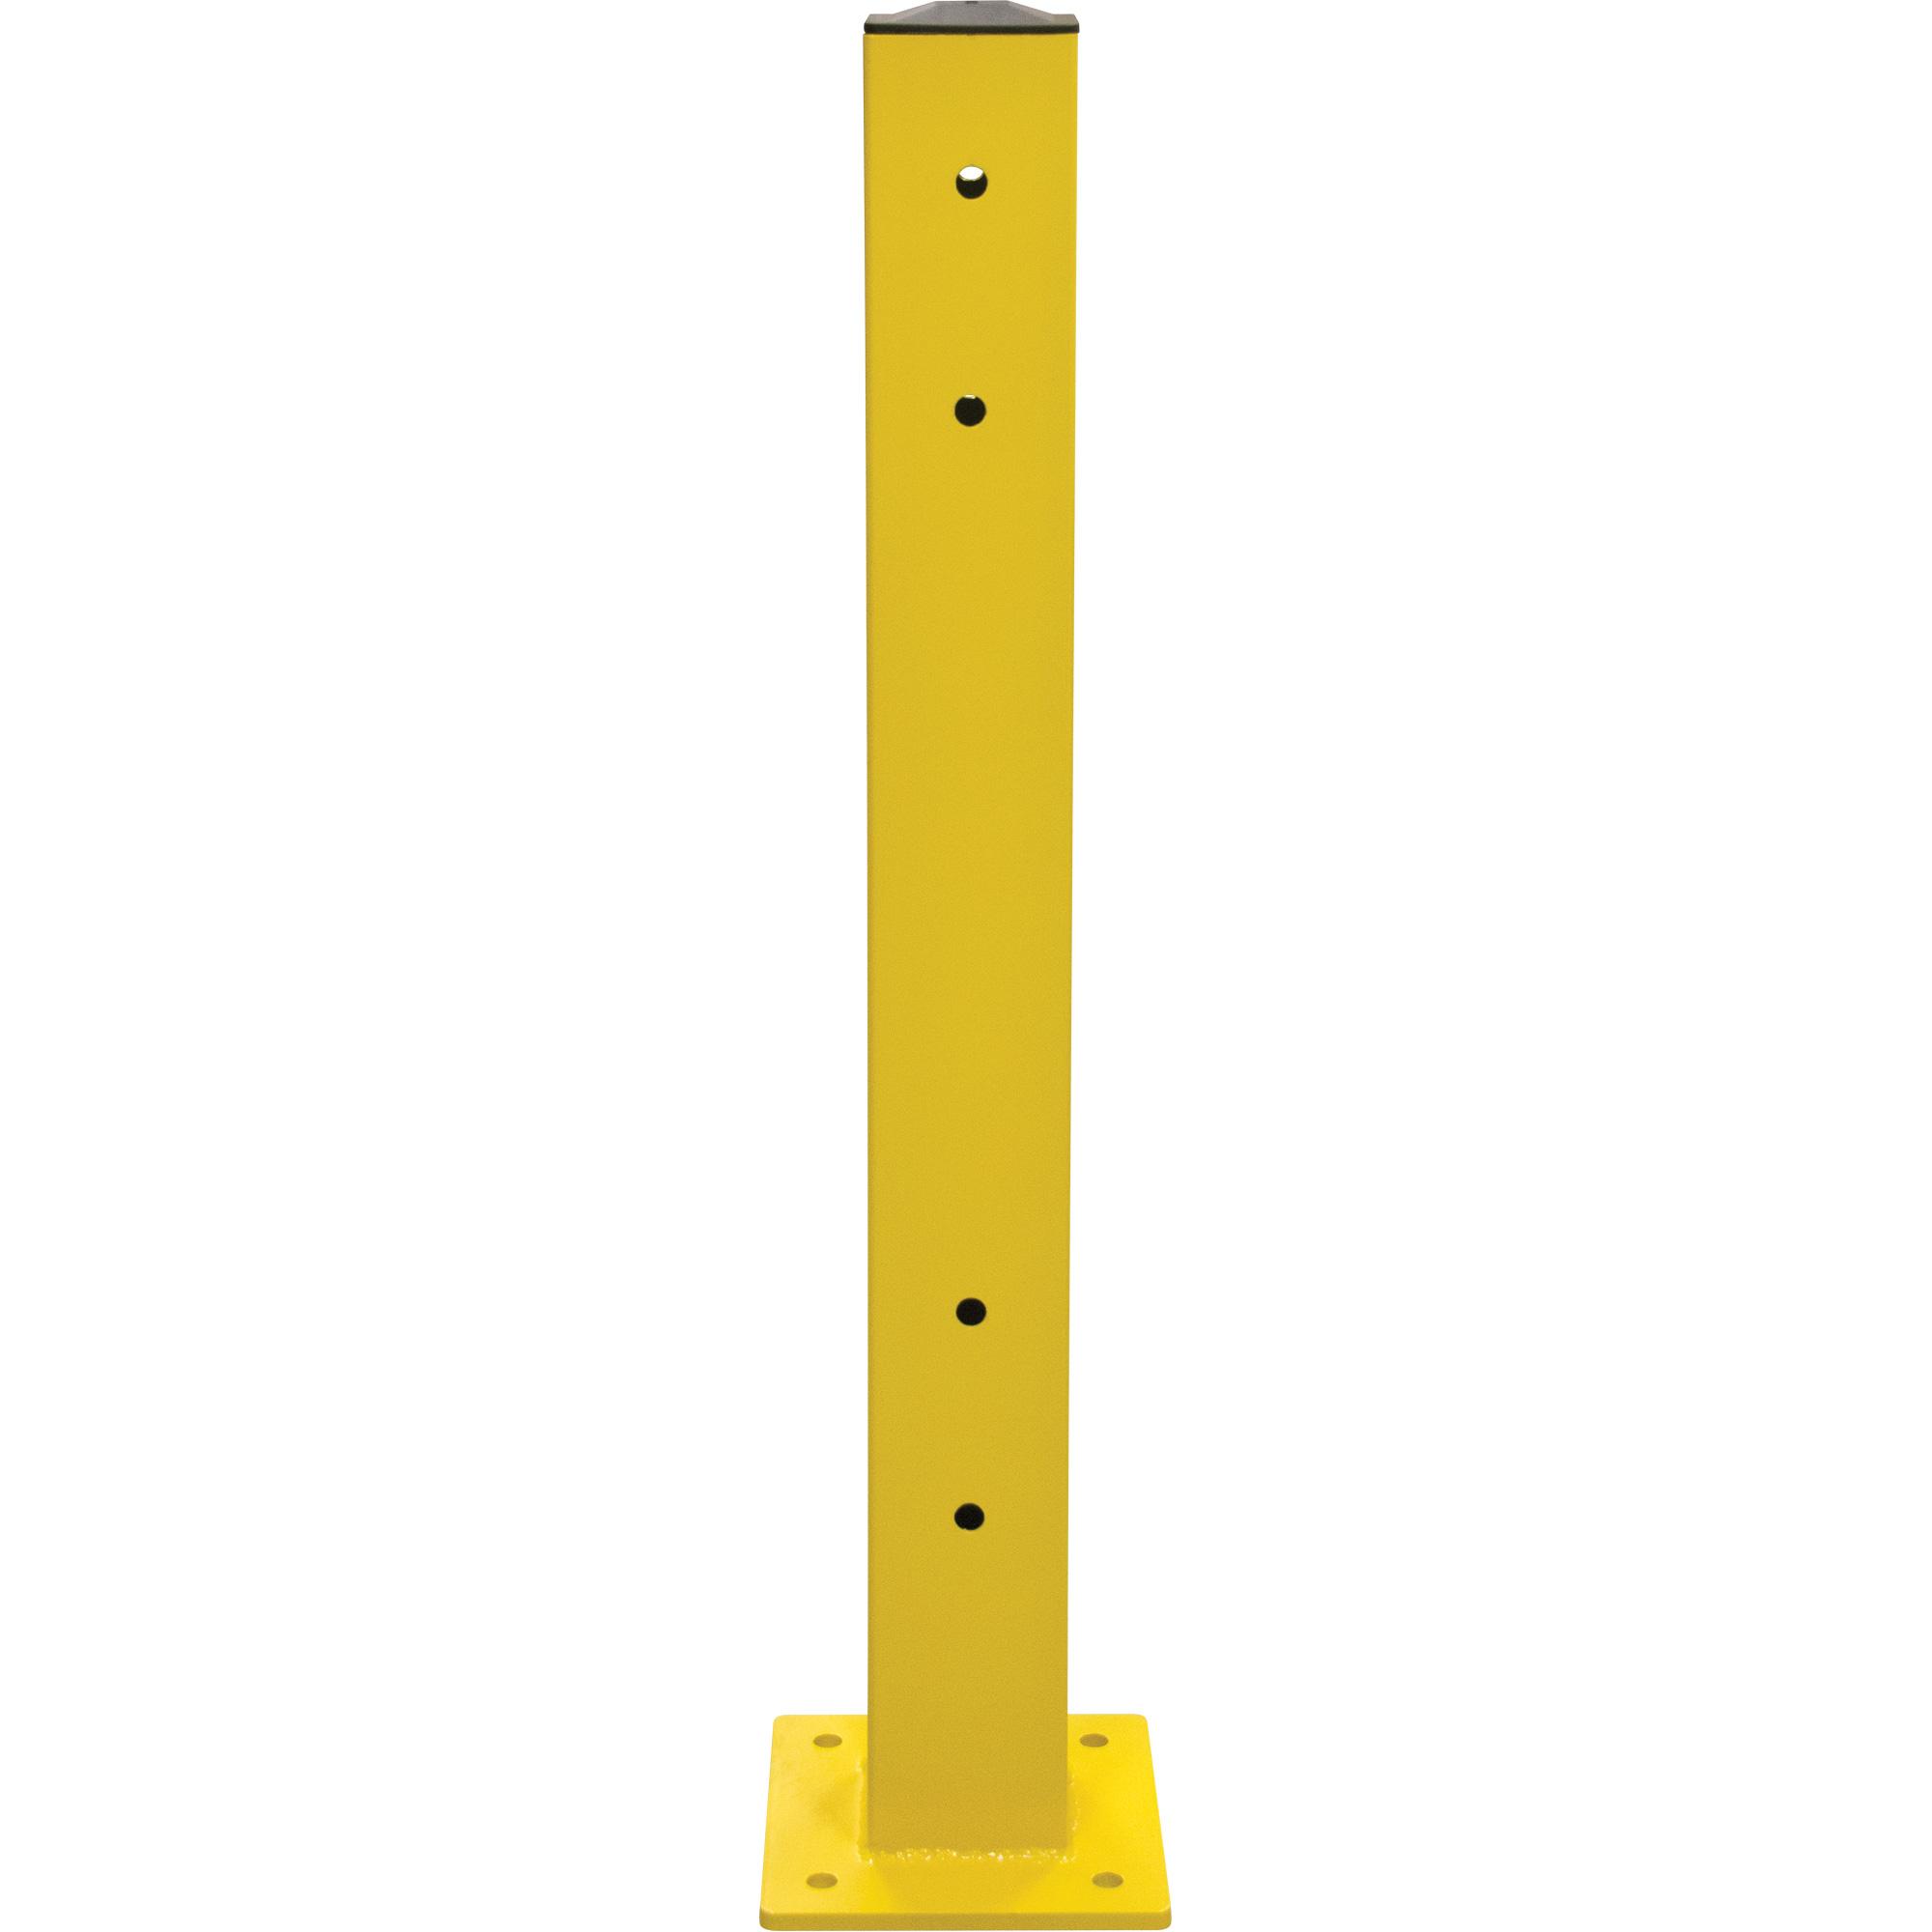 Double Guard Rail Post